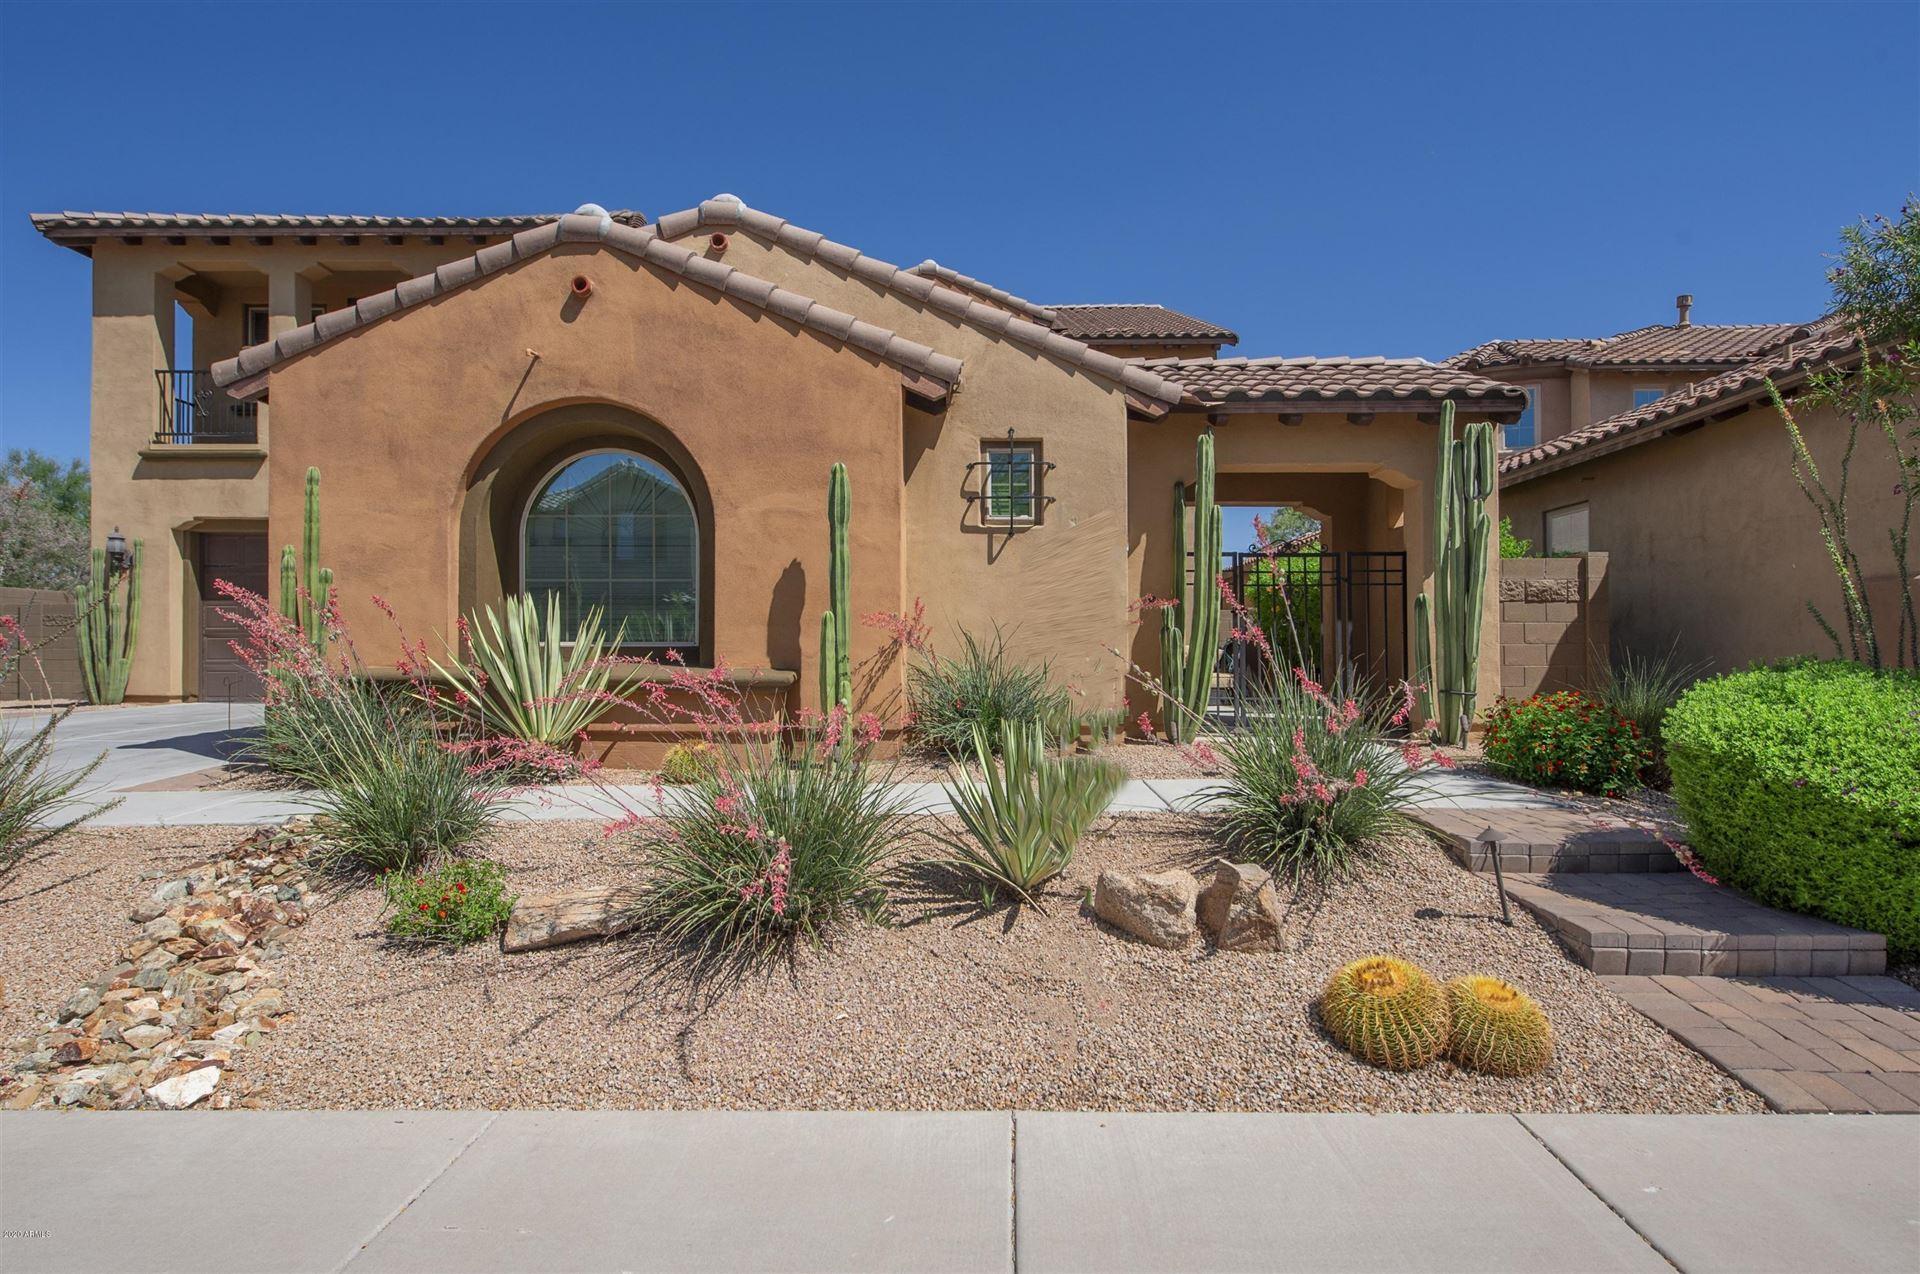 3706 E CAT BALUE Drive, Phoenix, AZ 85050 - MLS#: 6080725